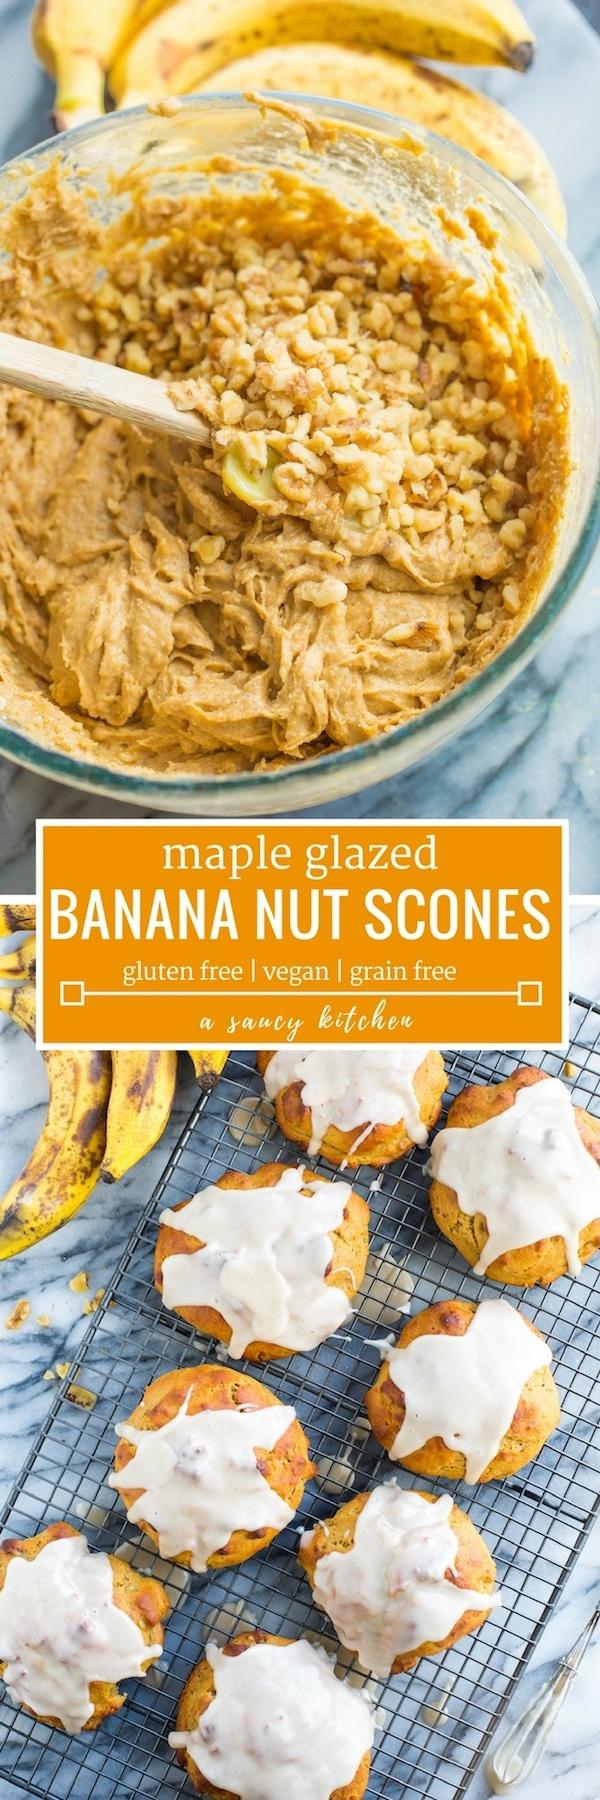 Banana Nut Scones Pinterest Graphic